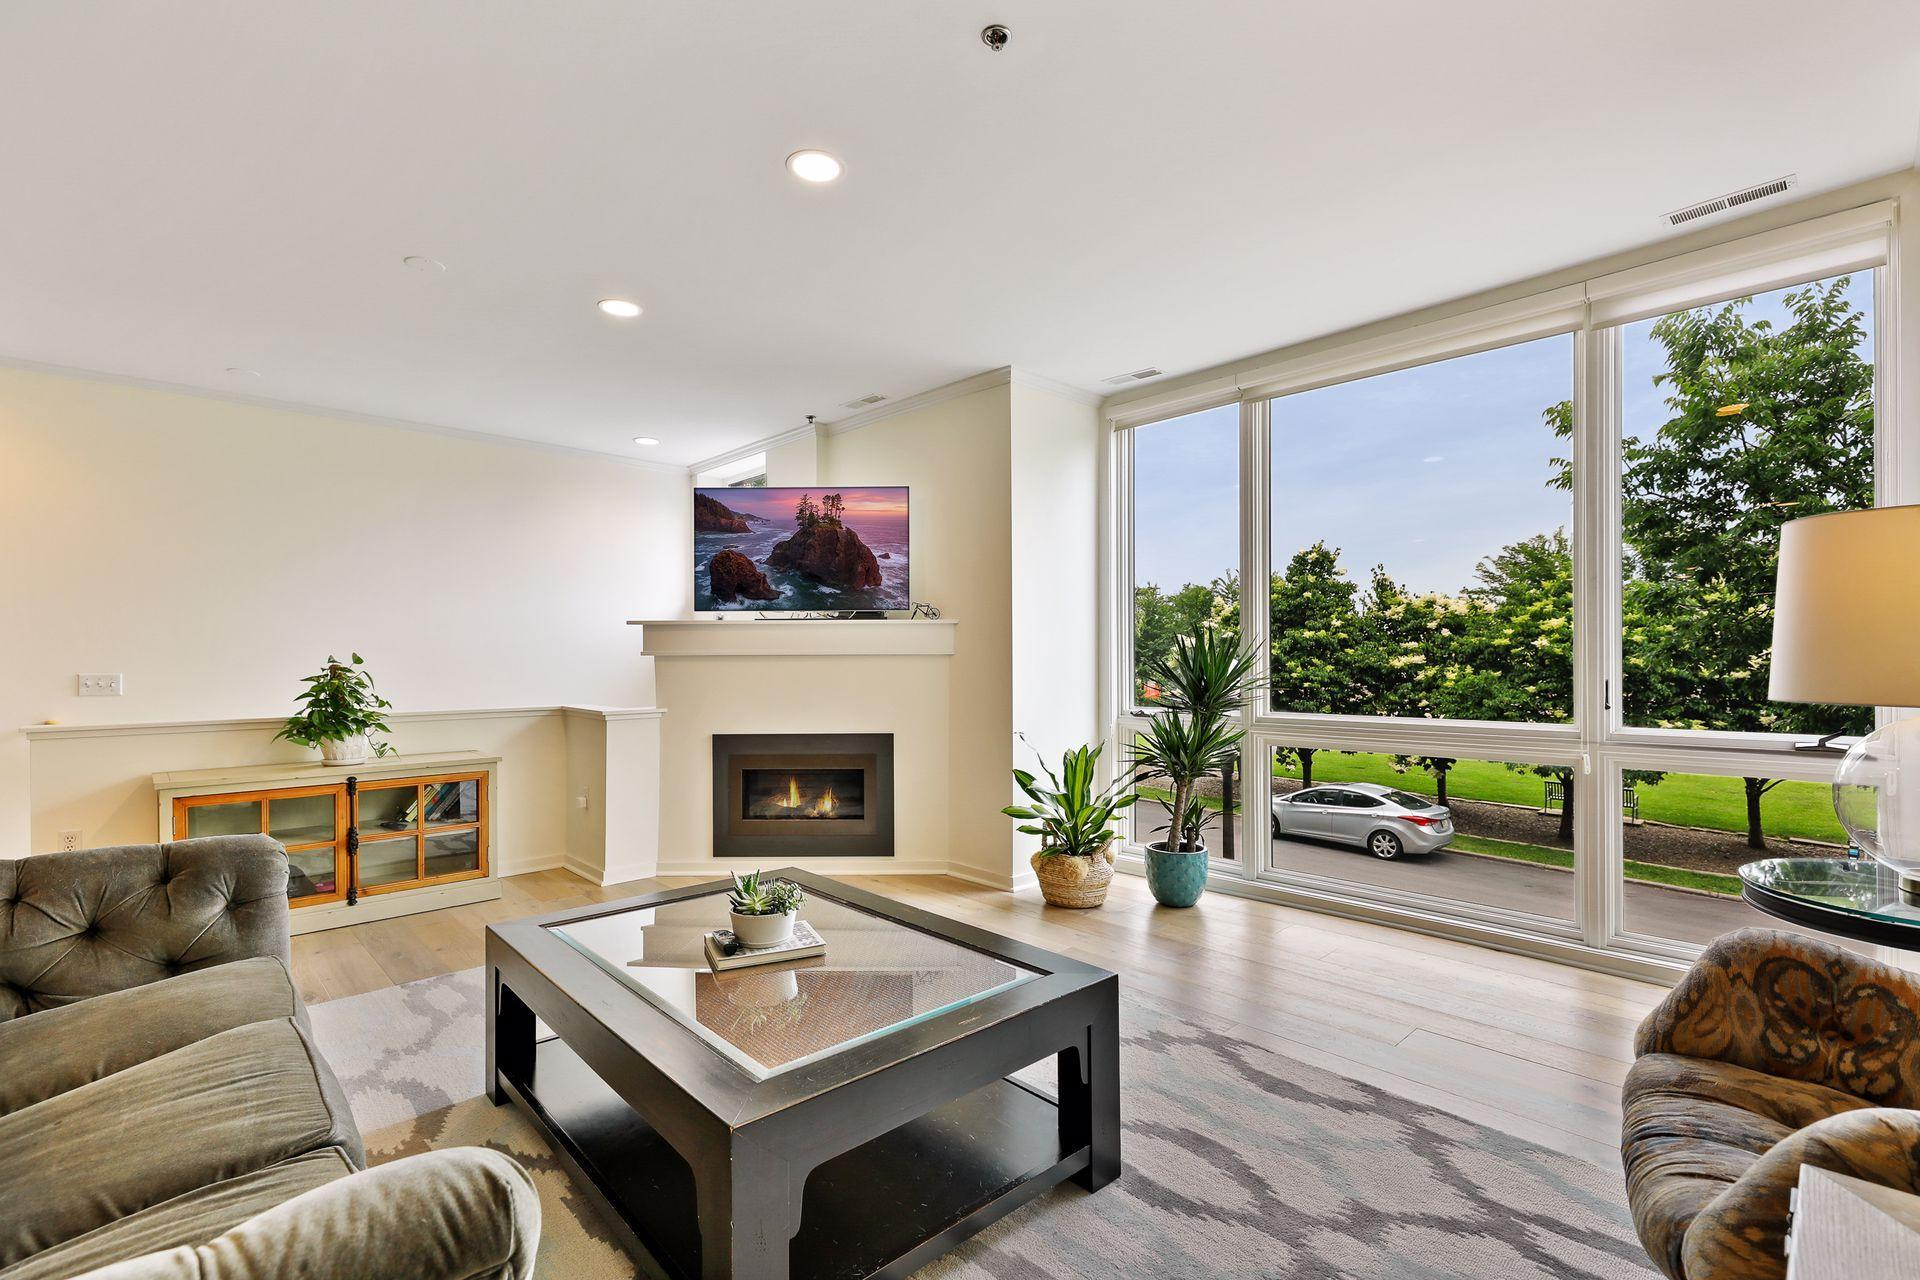 465 Sibley Street #465 Property Photo - Saint Paul, MN real estate listing